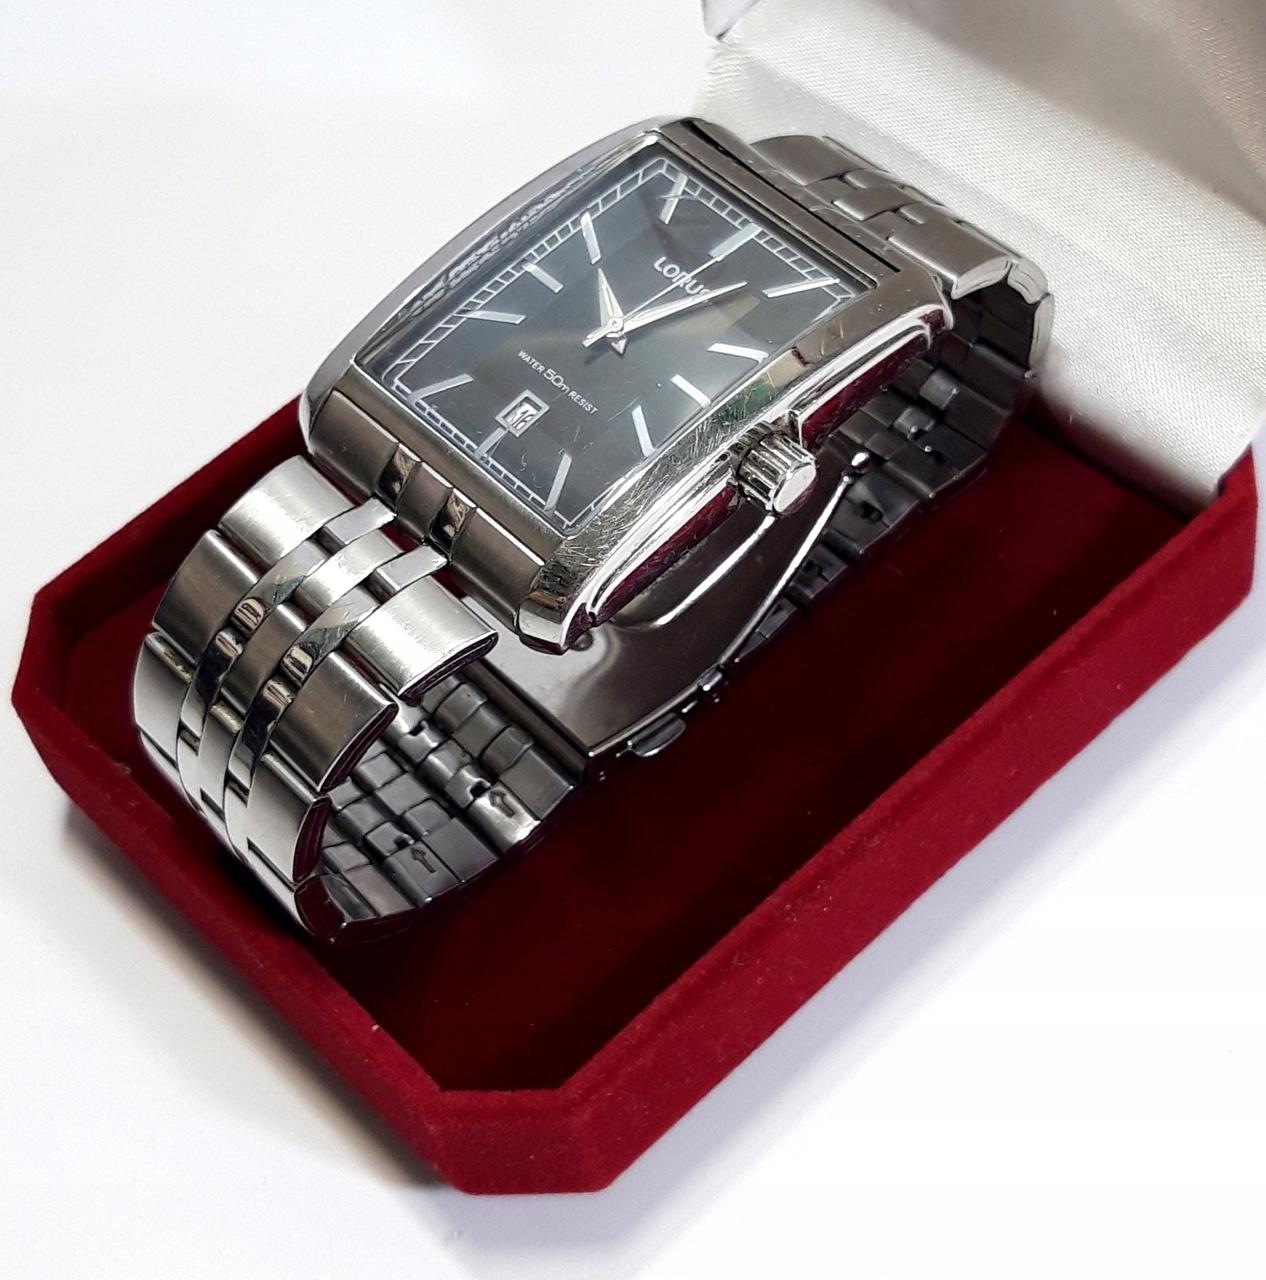 Zegarek Lorus VJ42-X068 Okazja!